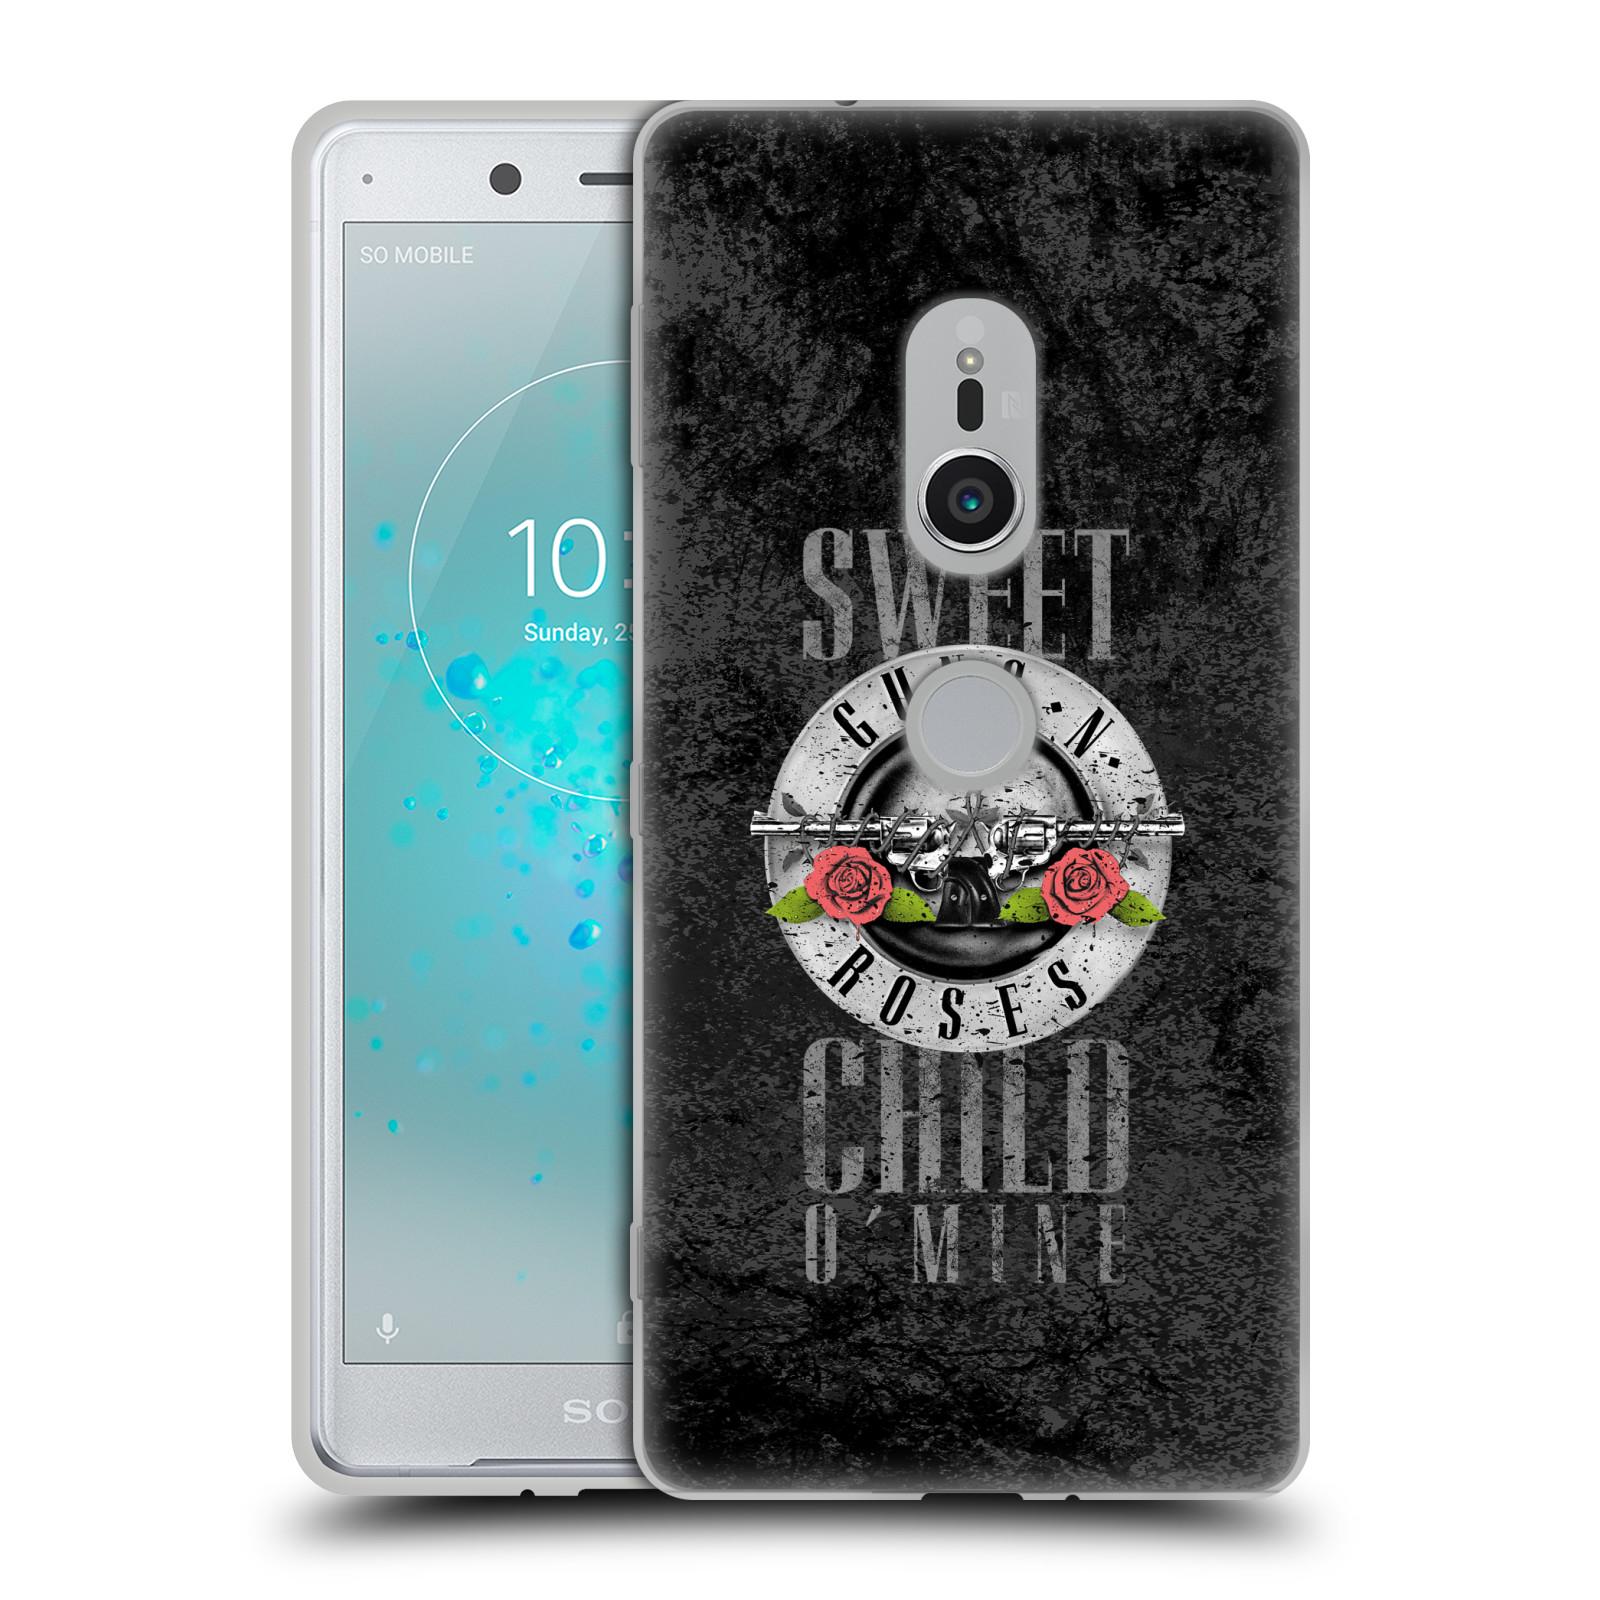 Silikonové pouzdro na mobil Sony Xperia XZ2 - Head Case - Guns N' Roses - Sweet Child